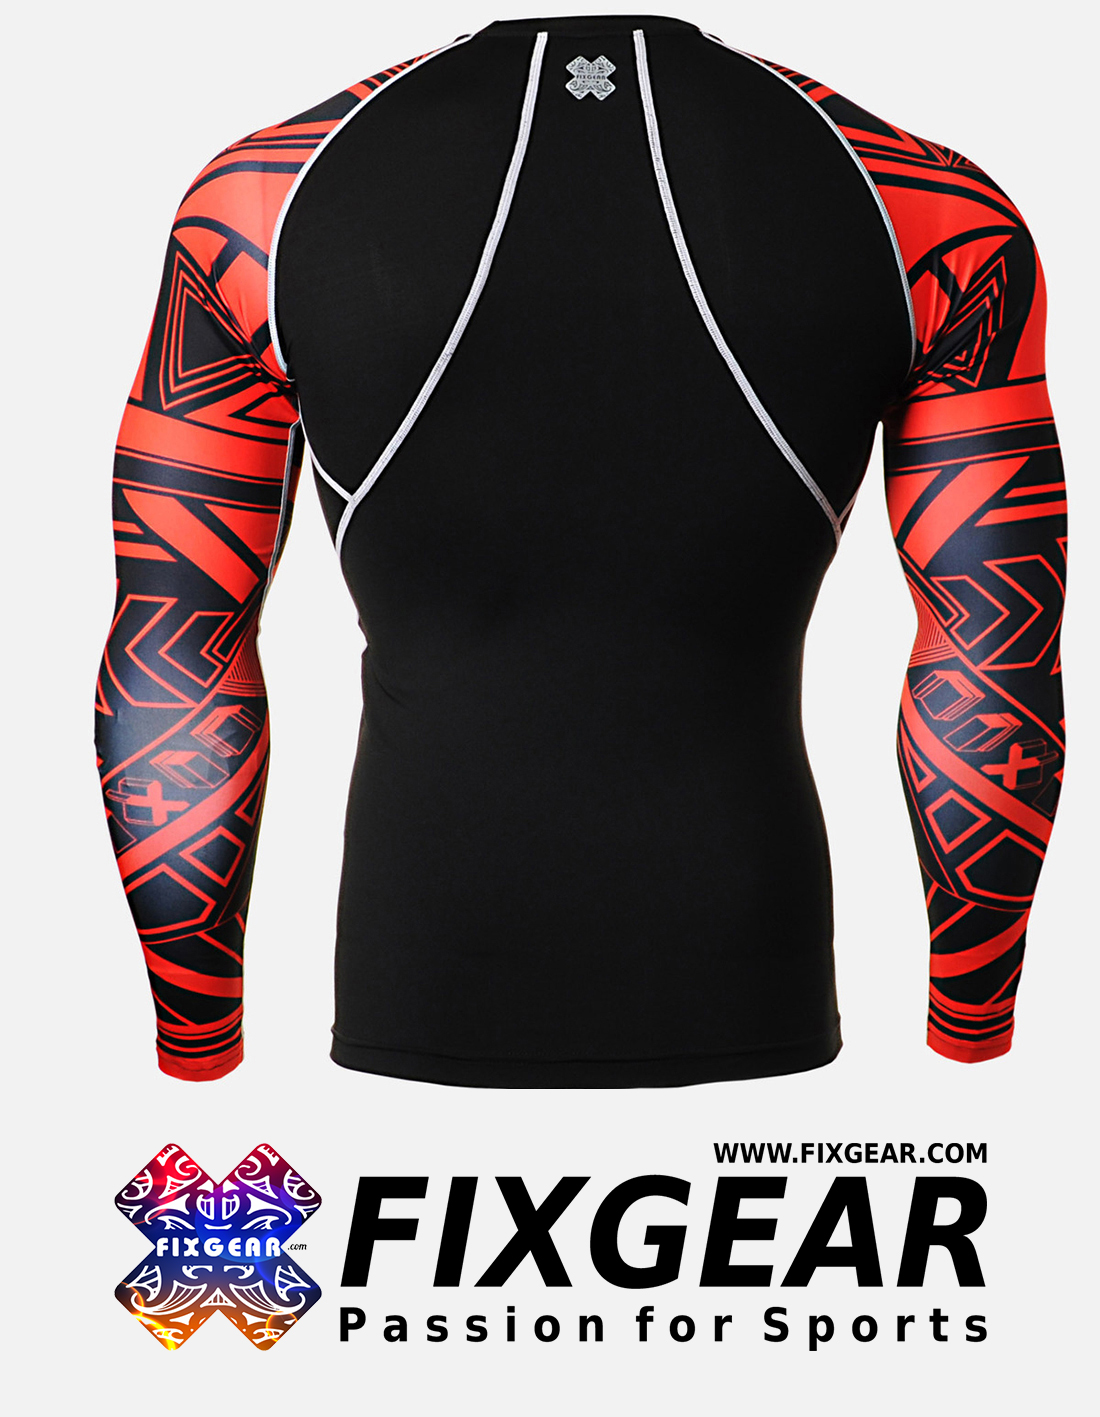 FIXGEAR CPD-B2 Compression Base Layer Shirt